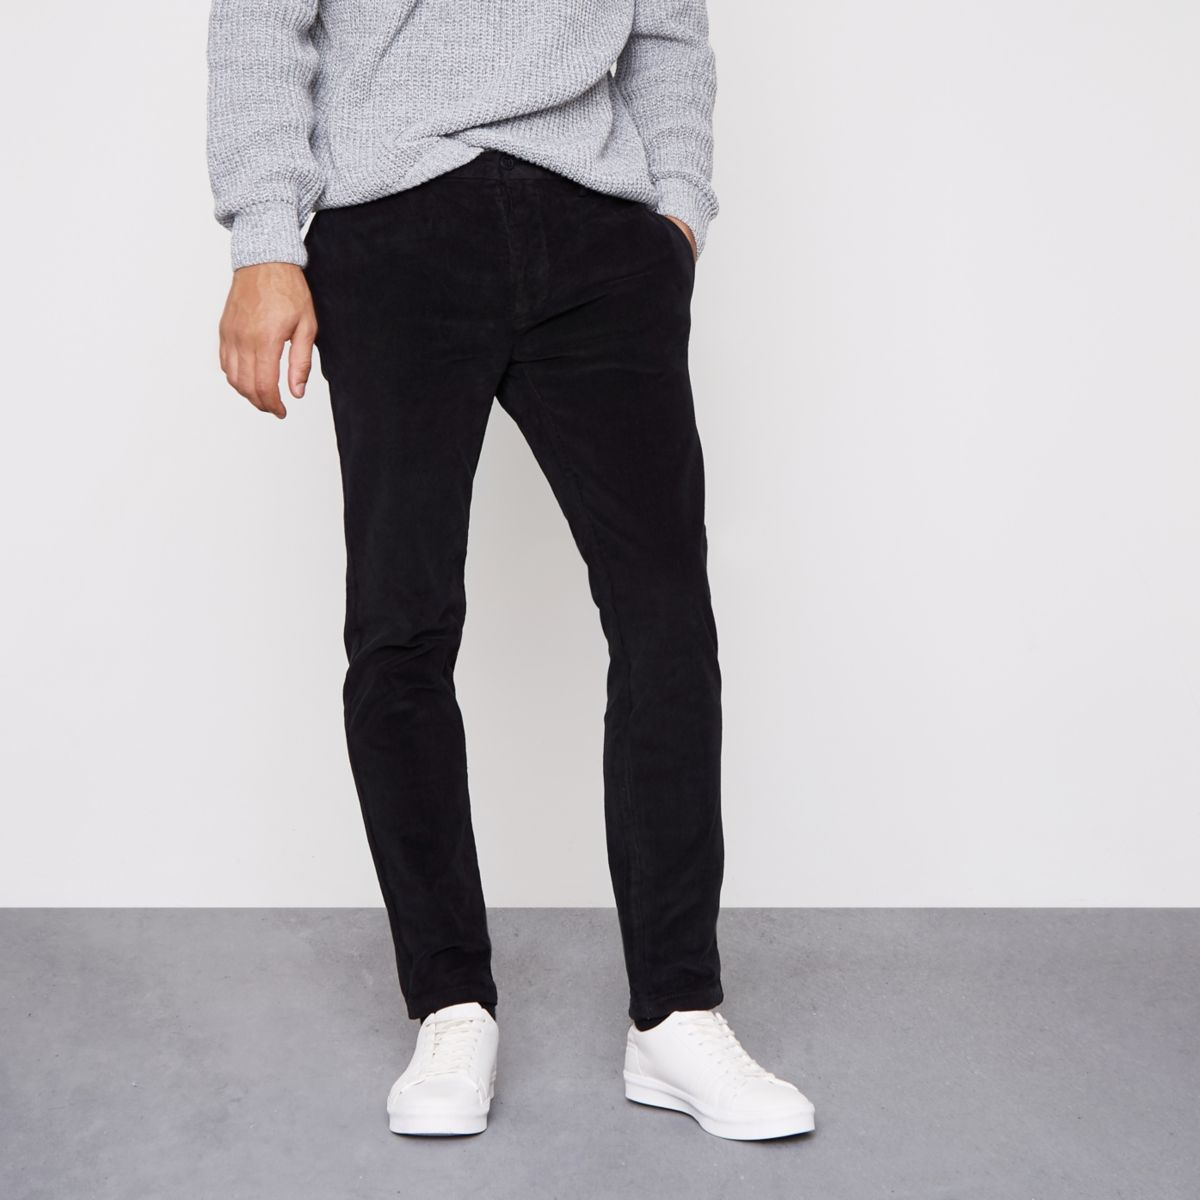 Schwarze, elegante Skinny Cordhose